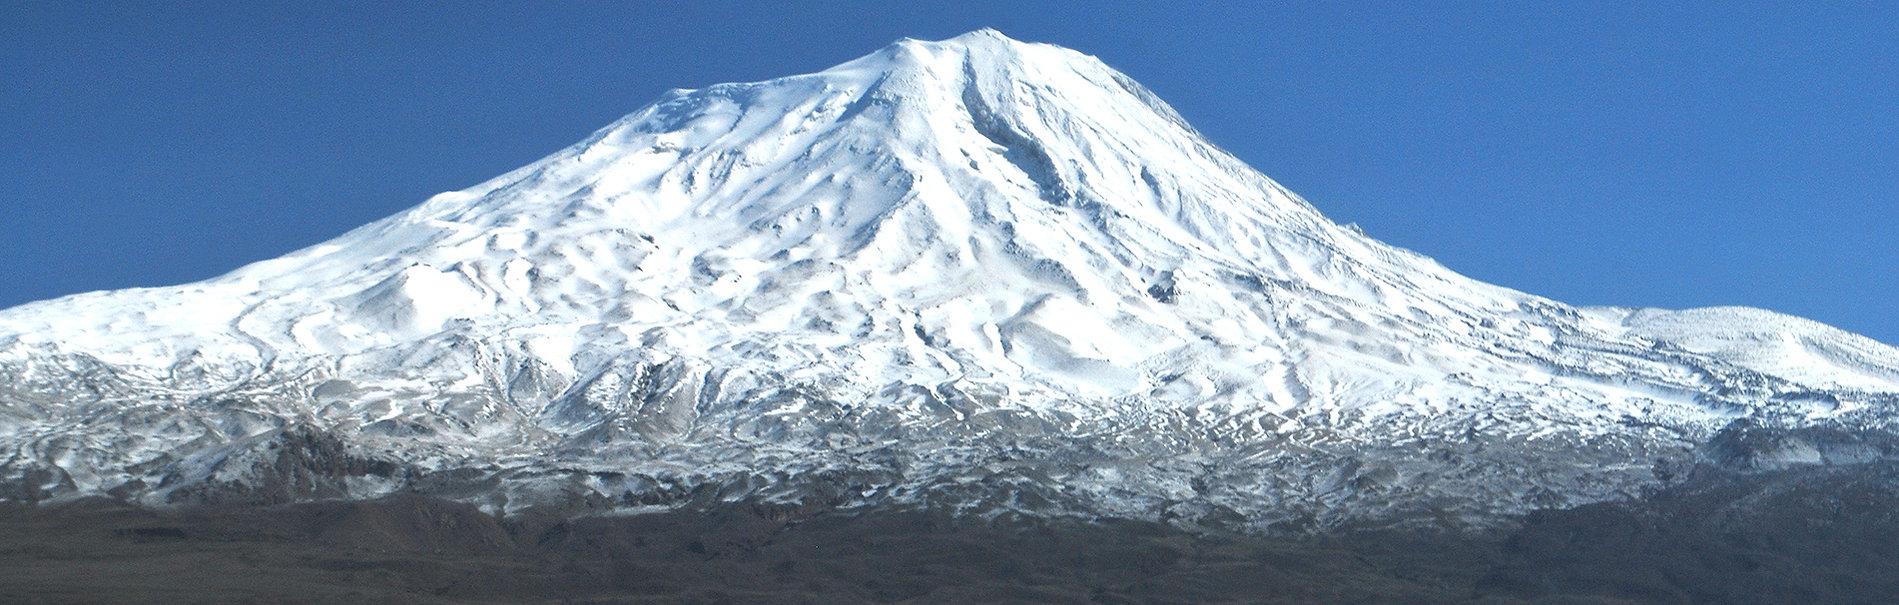 Ararat6.jpg